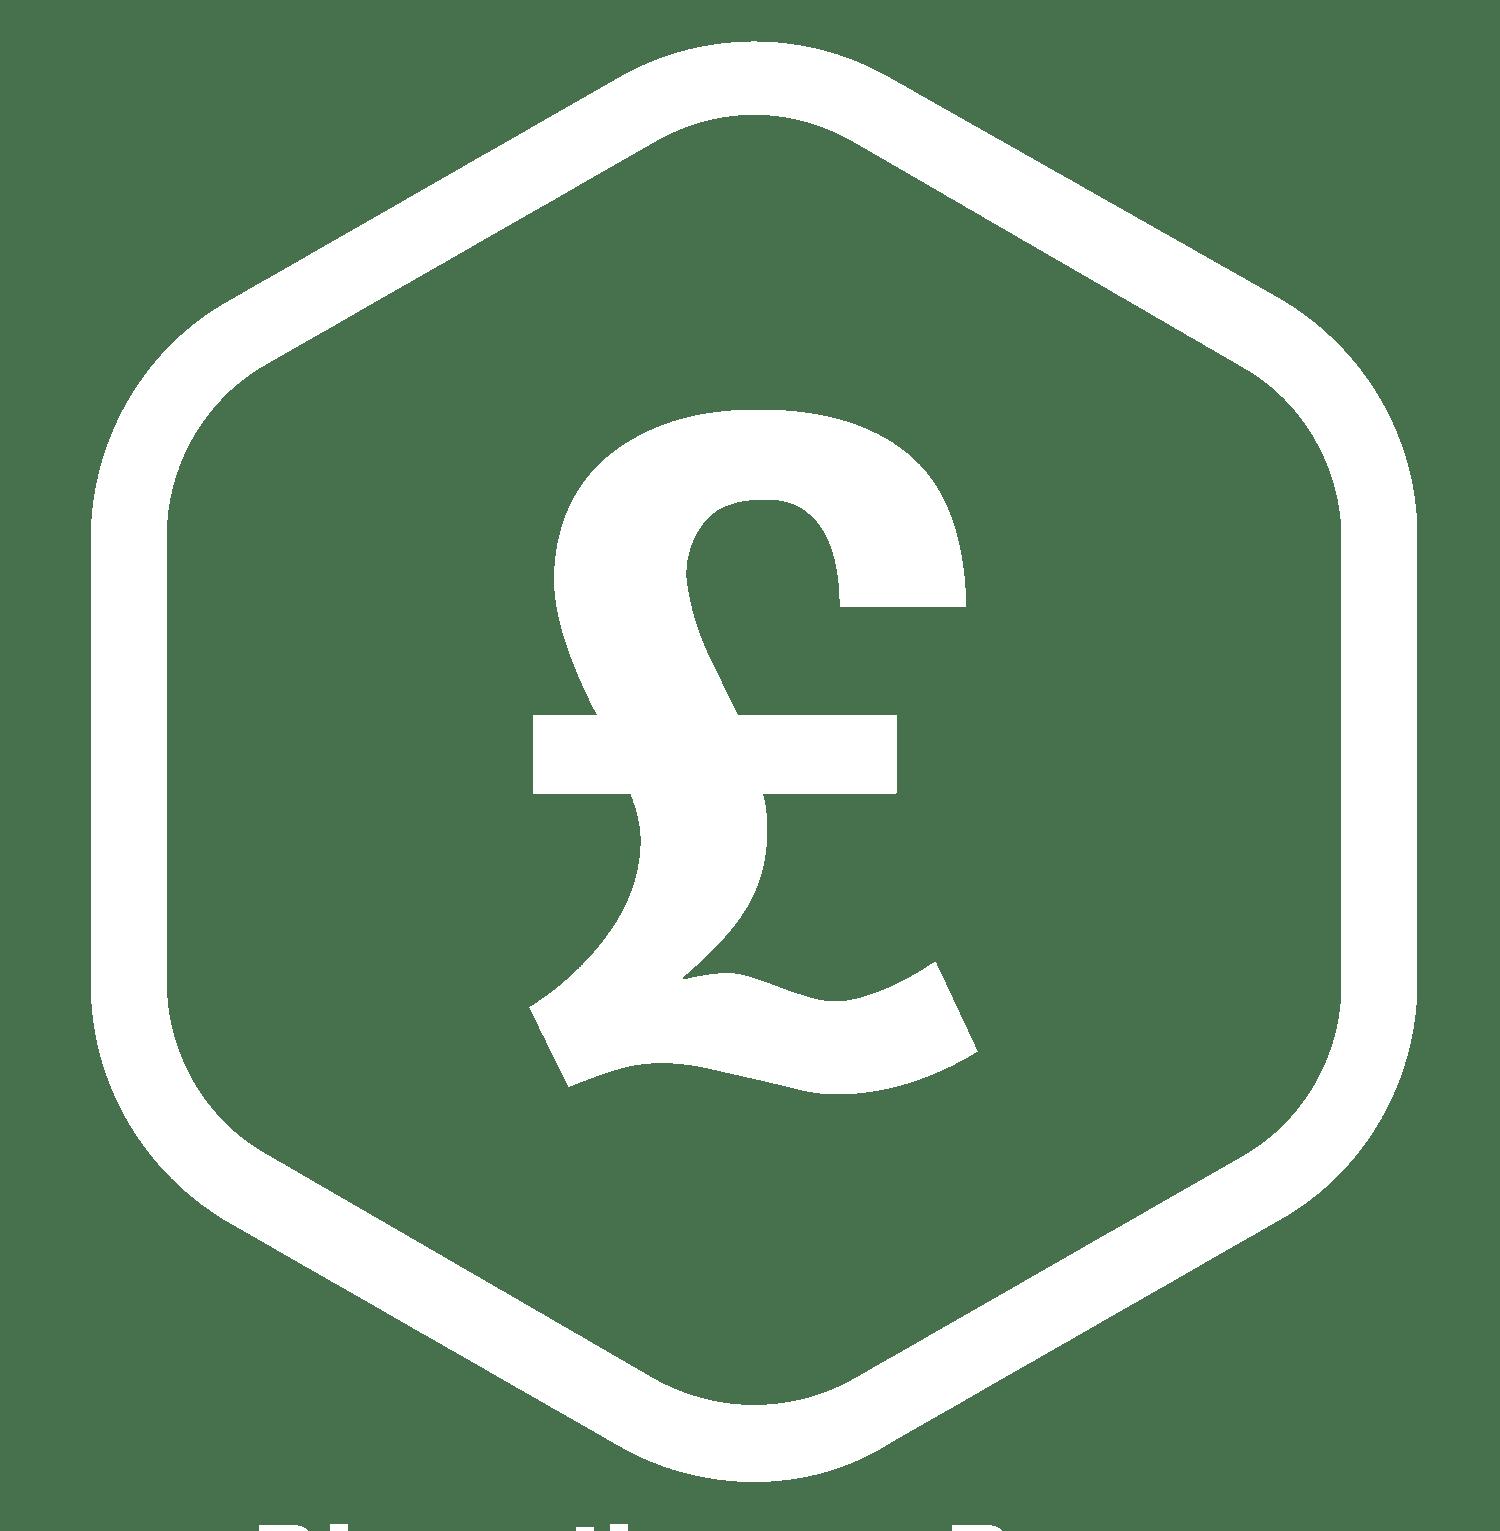 Discretionary Bonus Scheme image